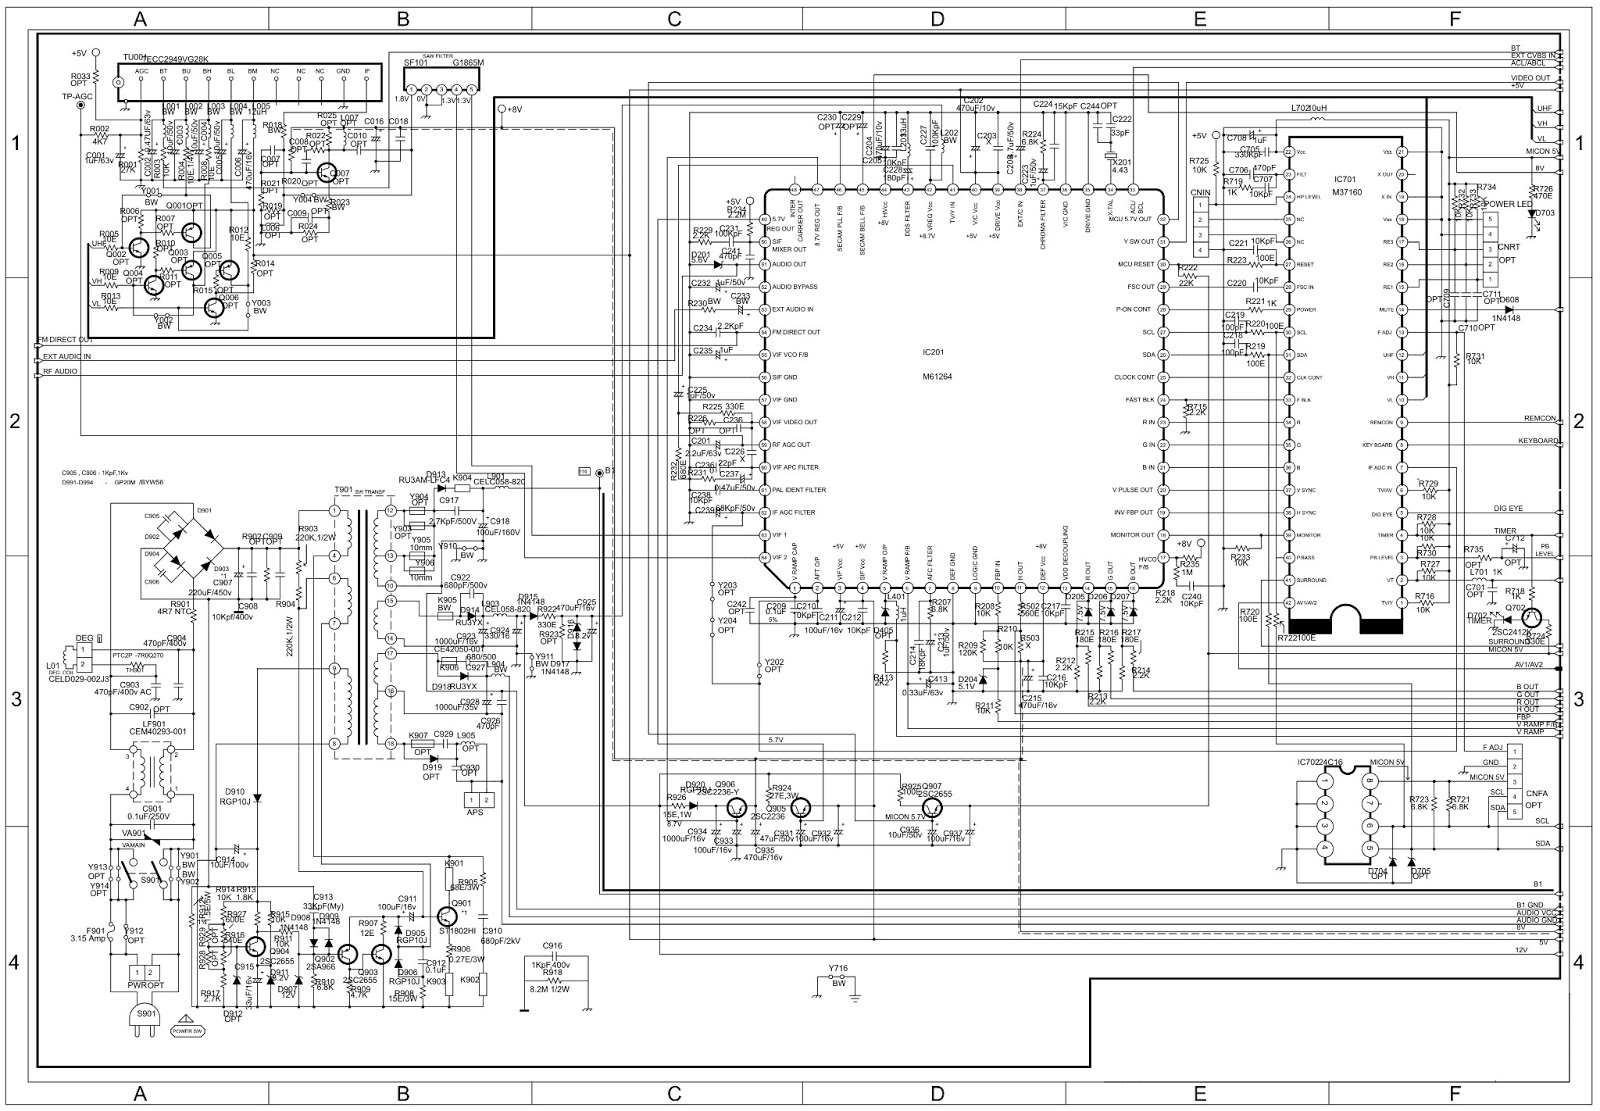 medium resolution of ics wiring diagram onida igo onida delite 21 onida delite 14